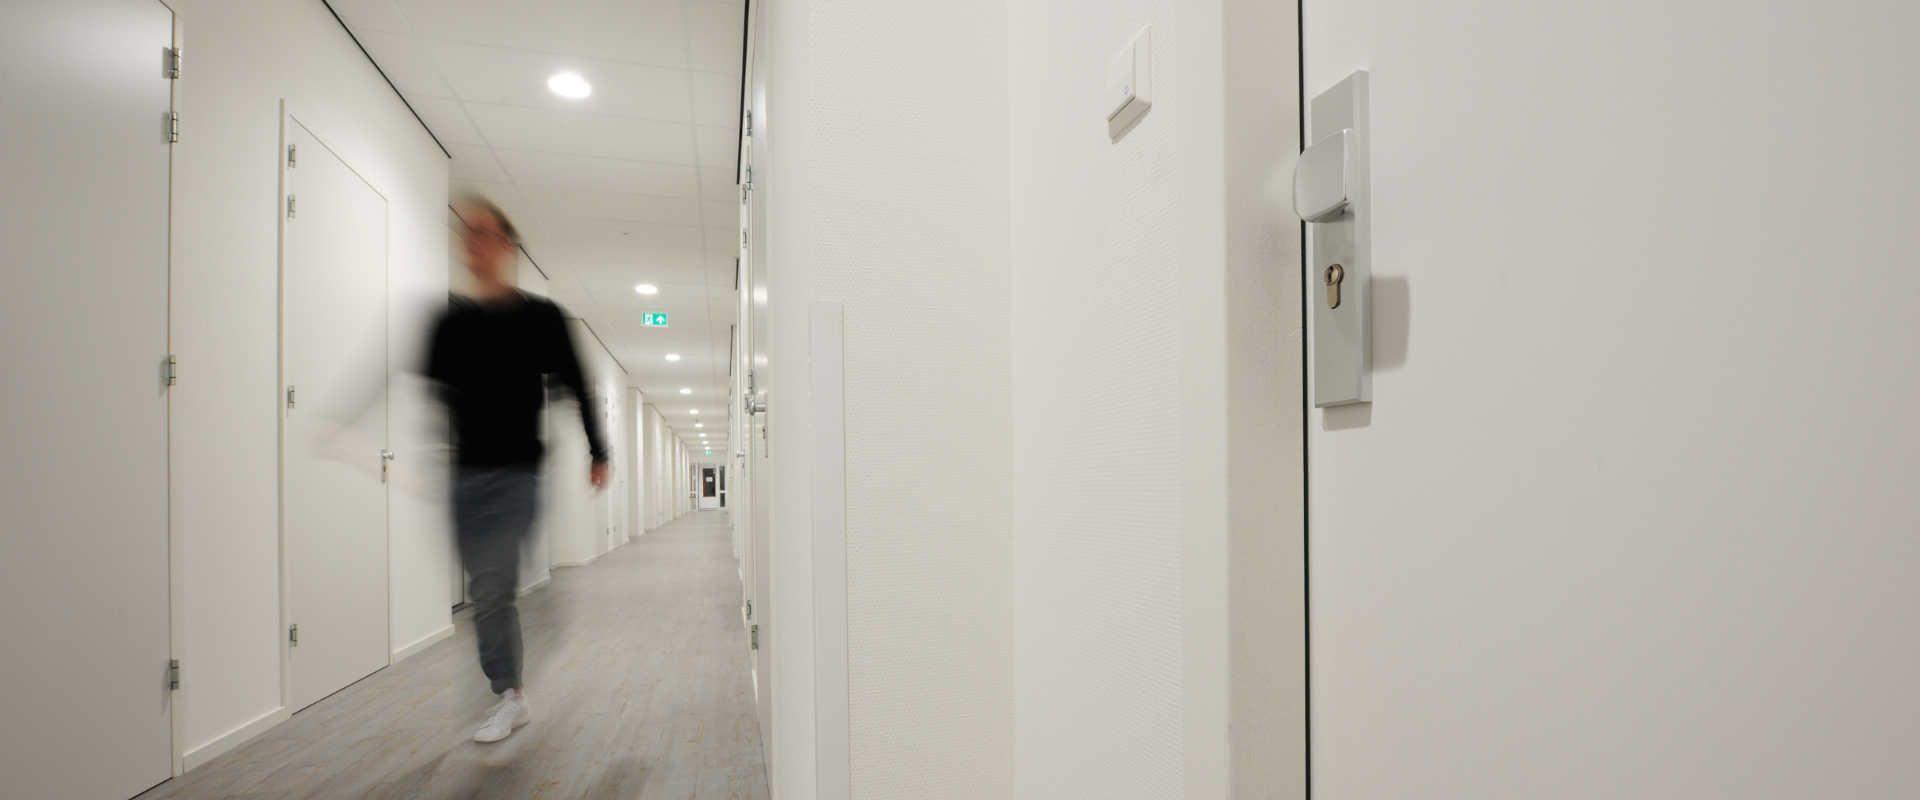 man walking through a hallway, focus on a door